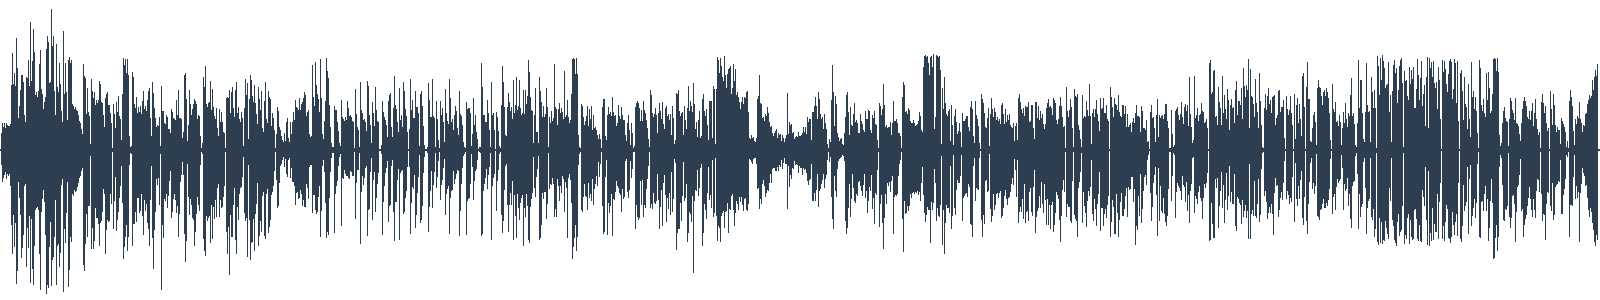 Mlýn na mumie (Audiokniha roku 2015) waveform